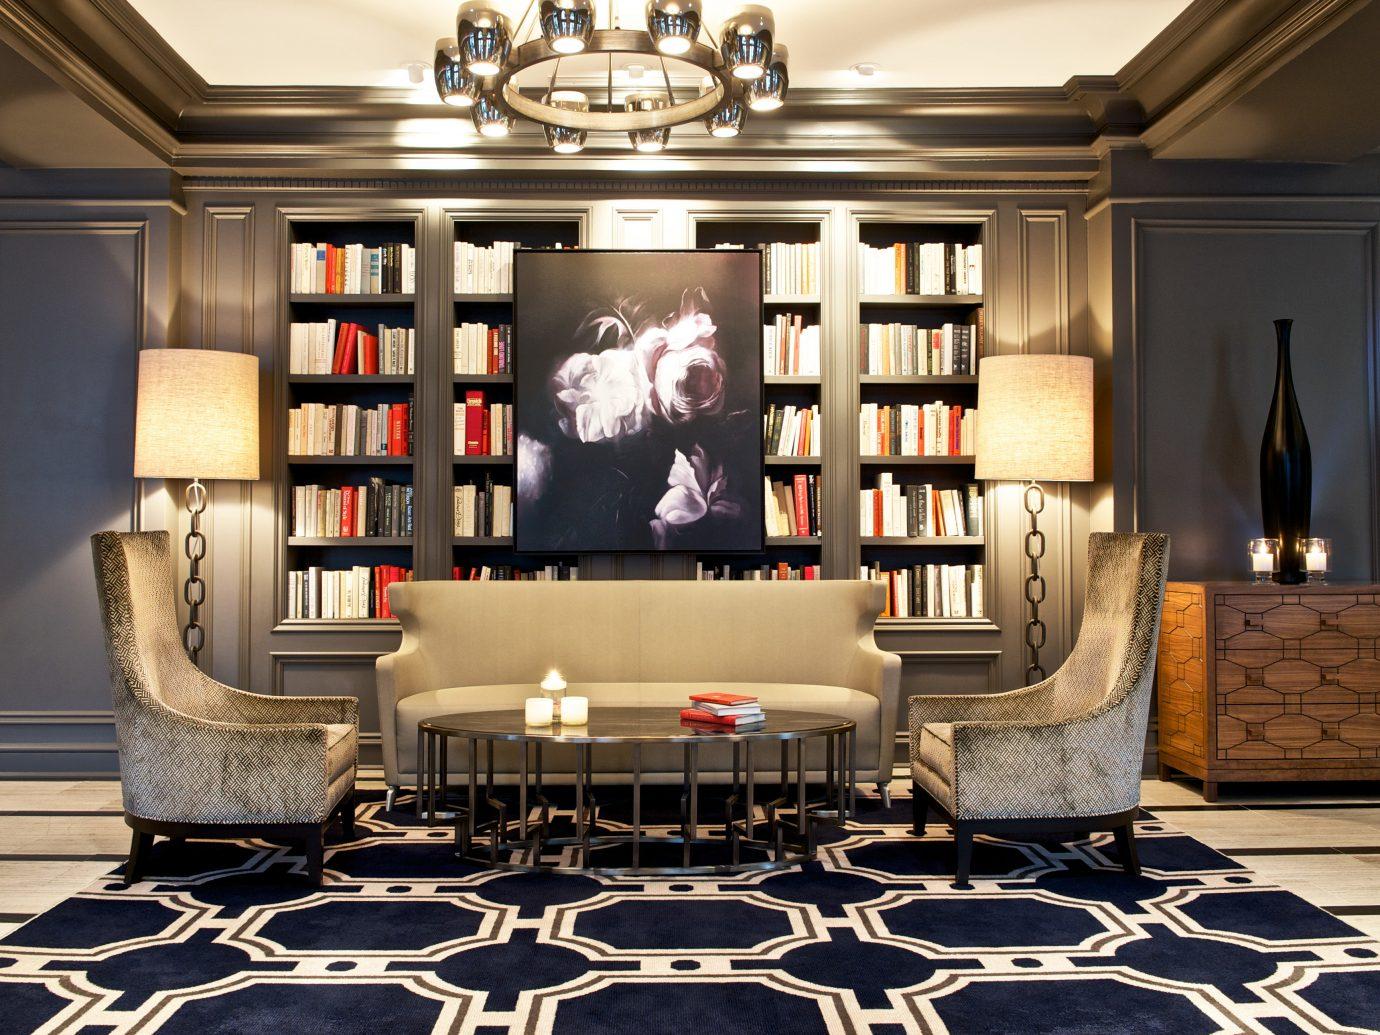 Boutique Budget City Hotels Lobby Lounge Modern indoor living room room ceiling interior design home furniture Design dining room estate decorated